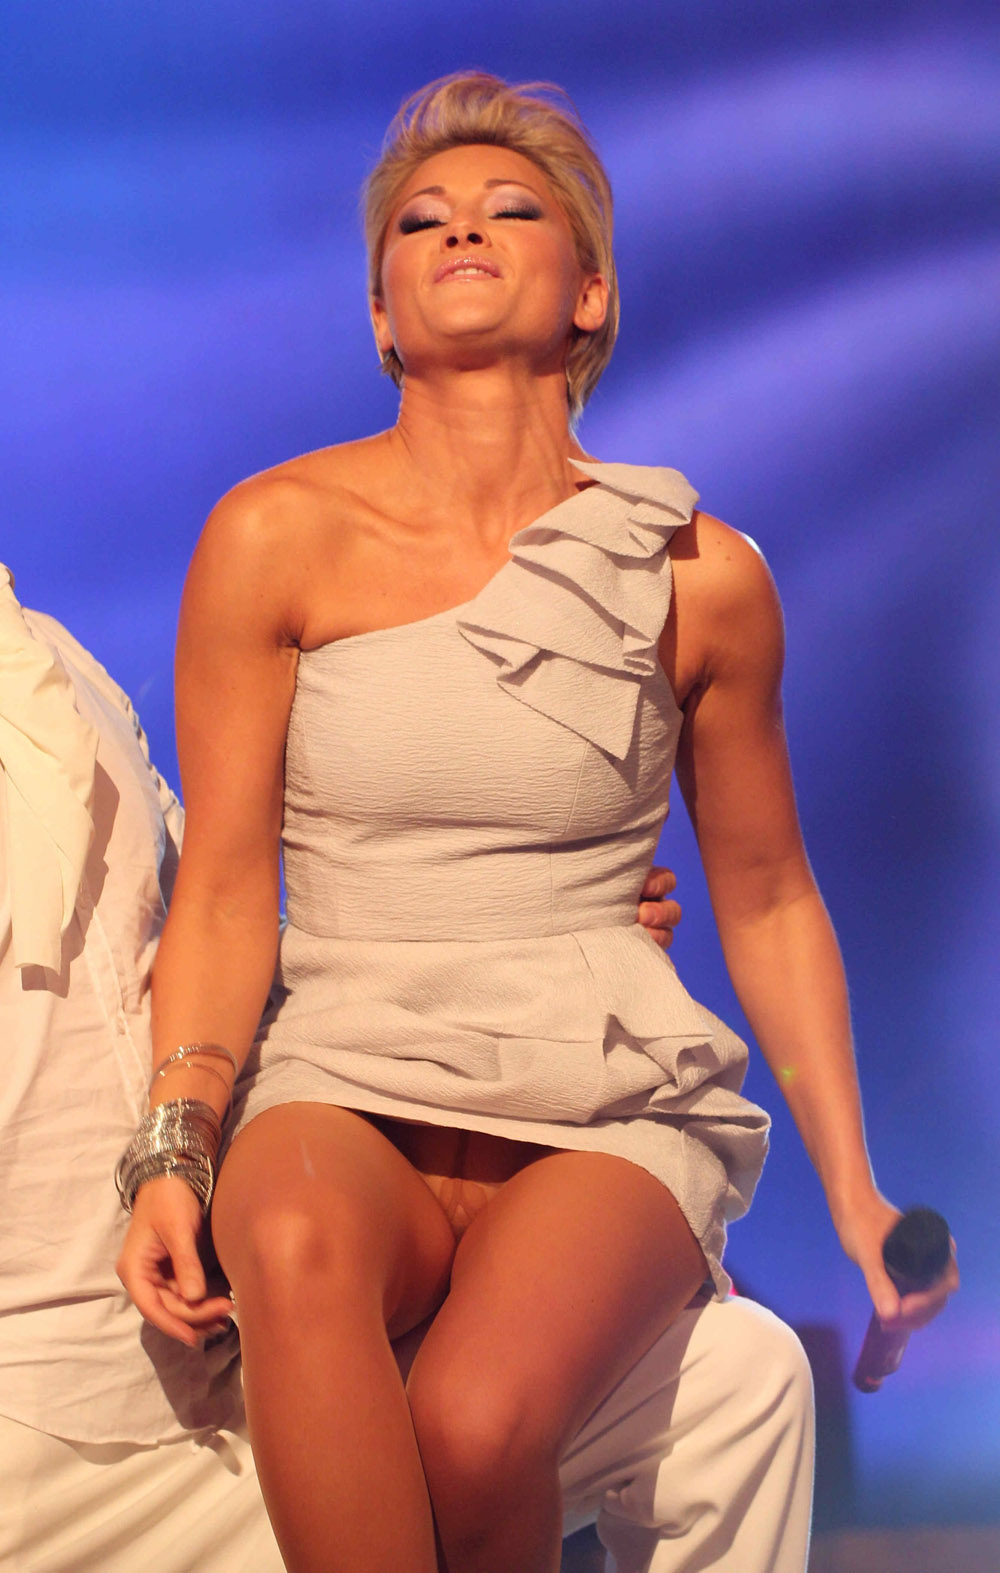 Хелен Фишер голая. Фото - 2